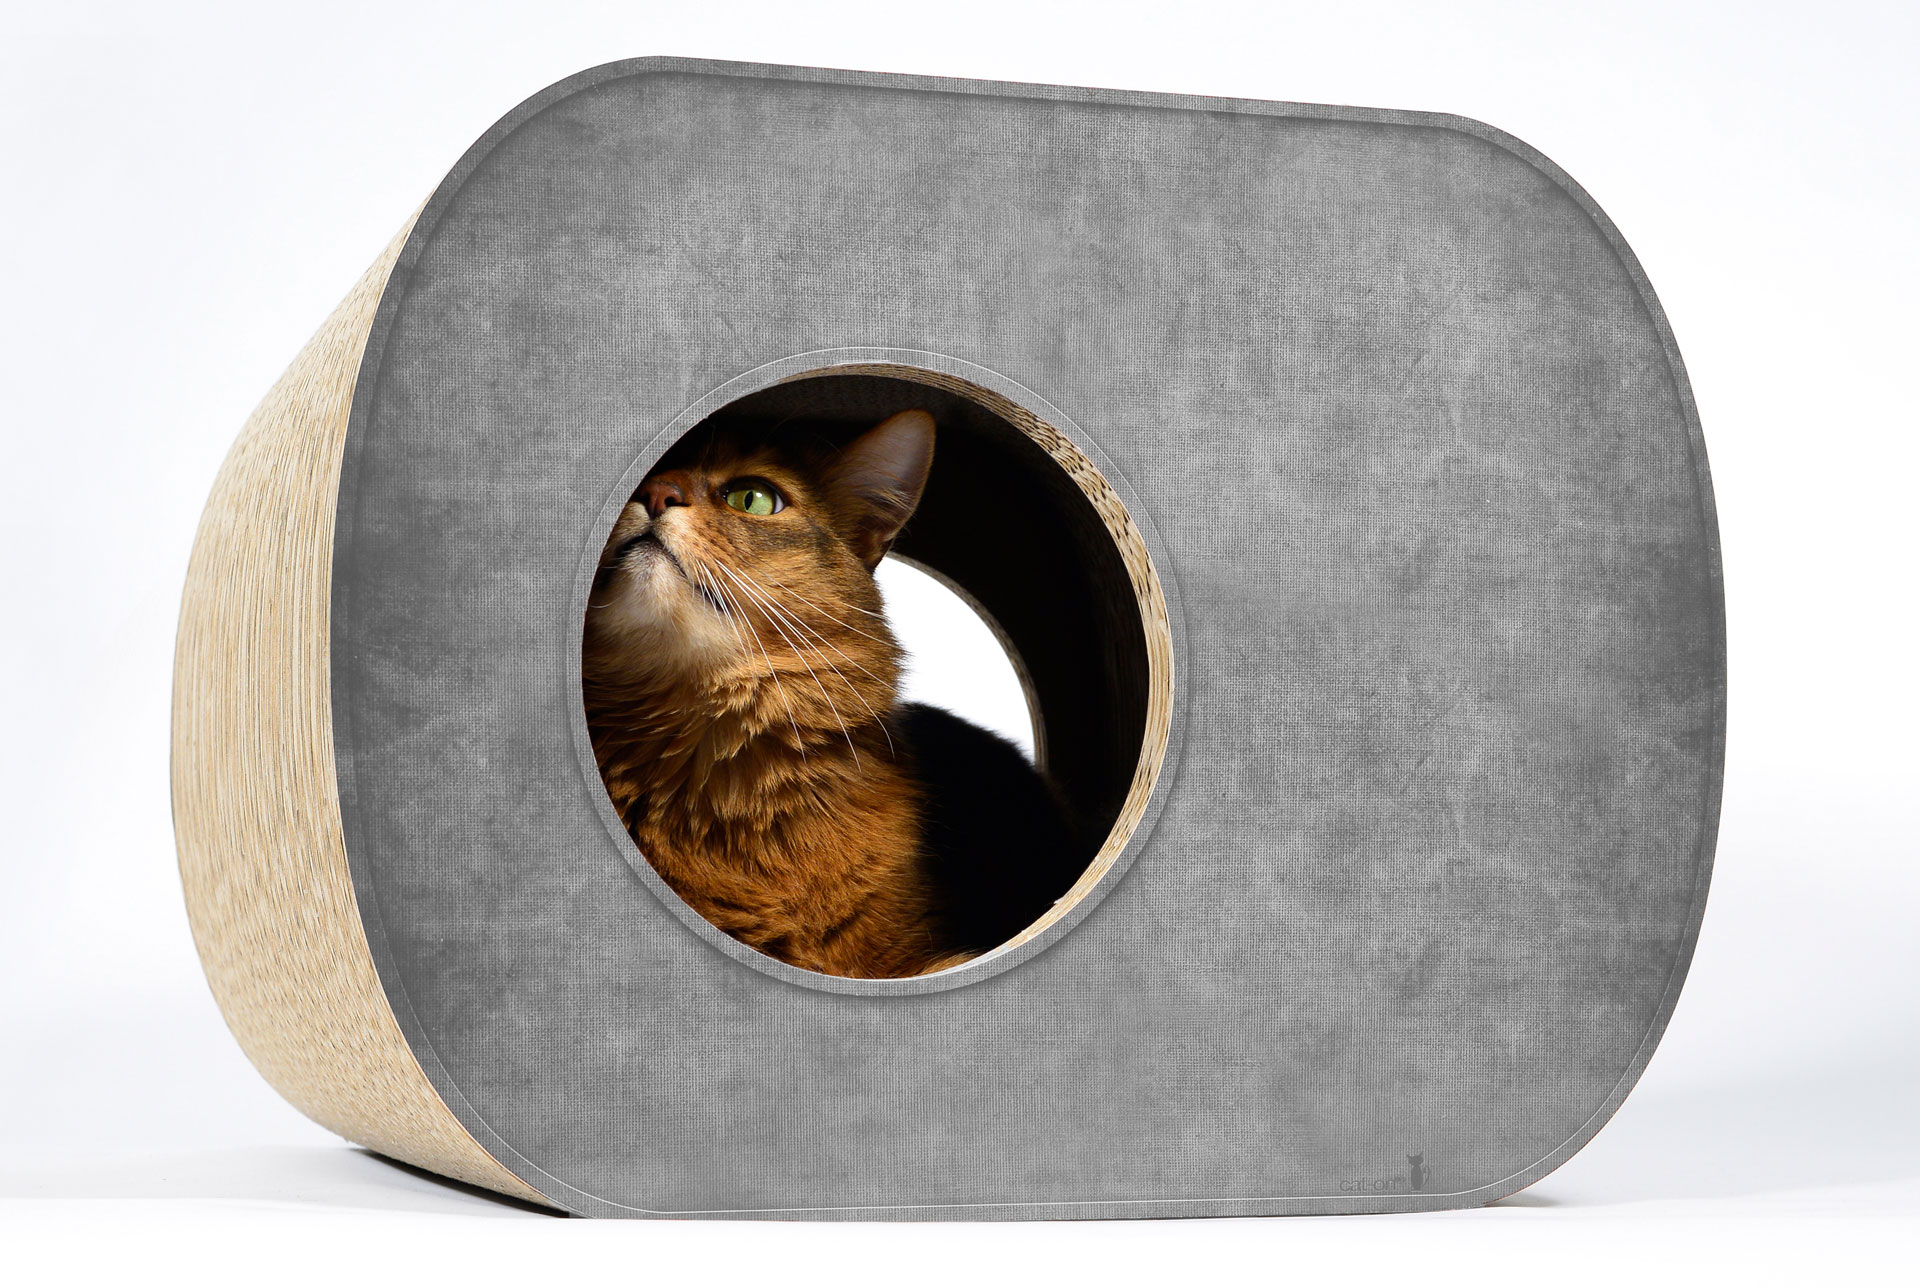 Kratzpappe Brochhaus Junior | Katzenhöhle aus Wellpappe in elegantem Design